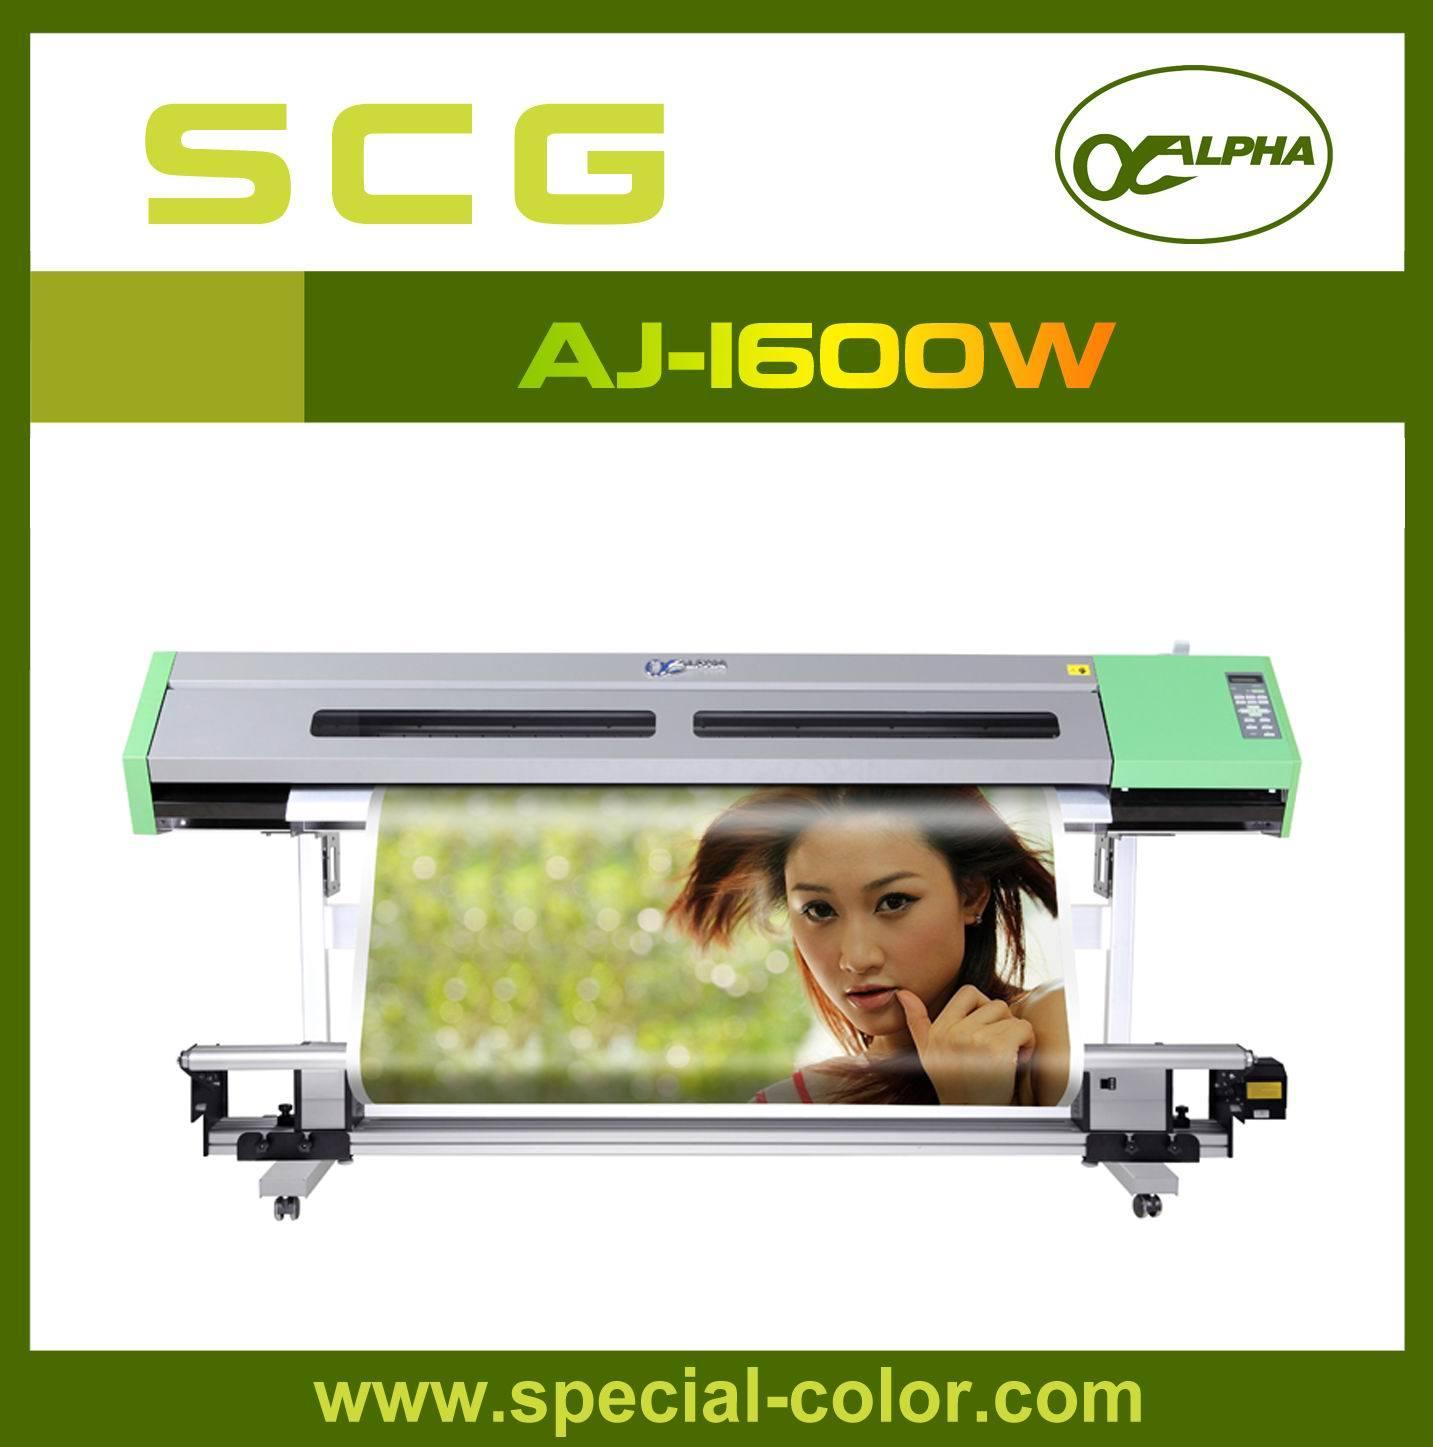 Dx5 Large Format Printer Aj-1600 (S)